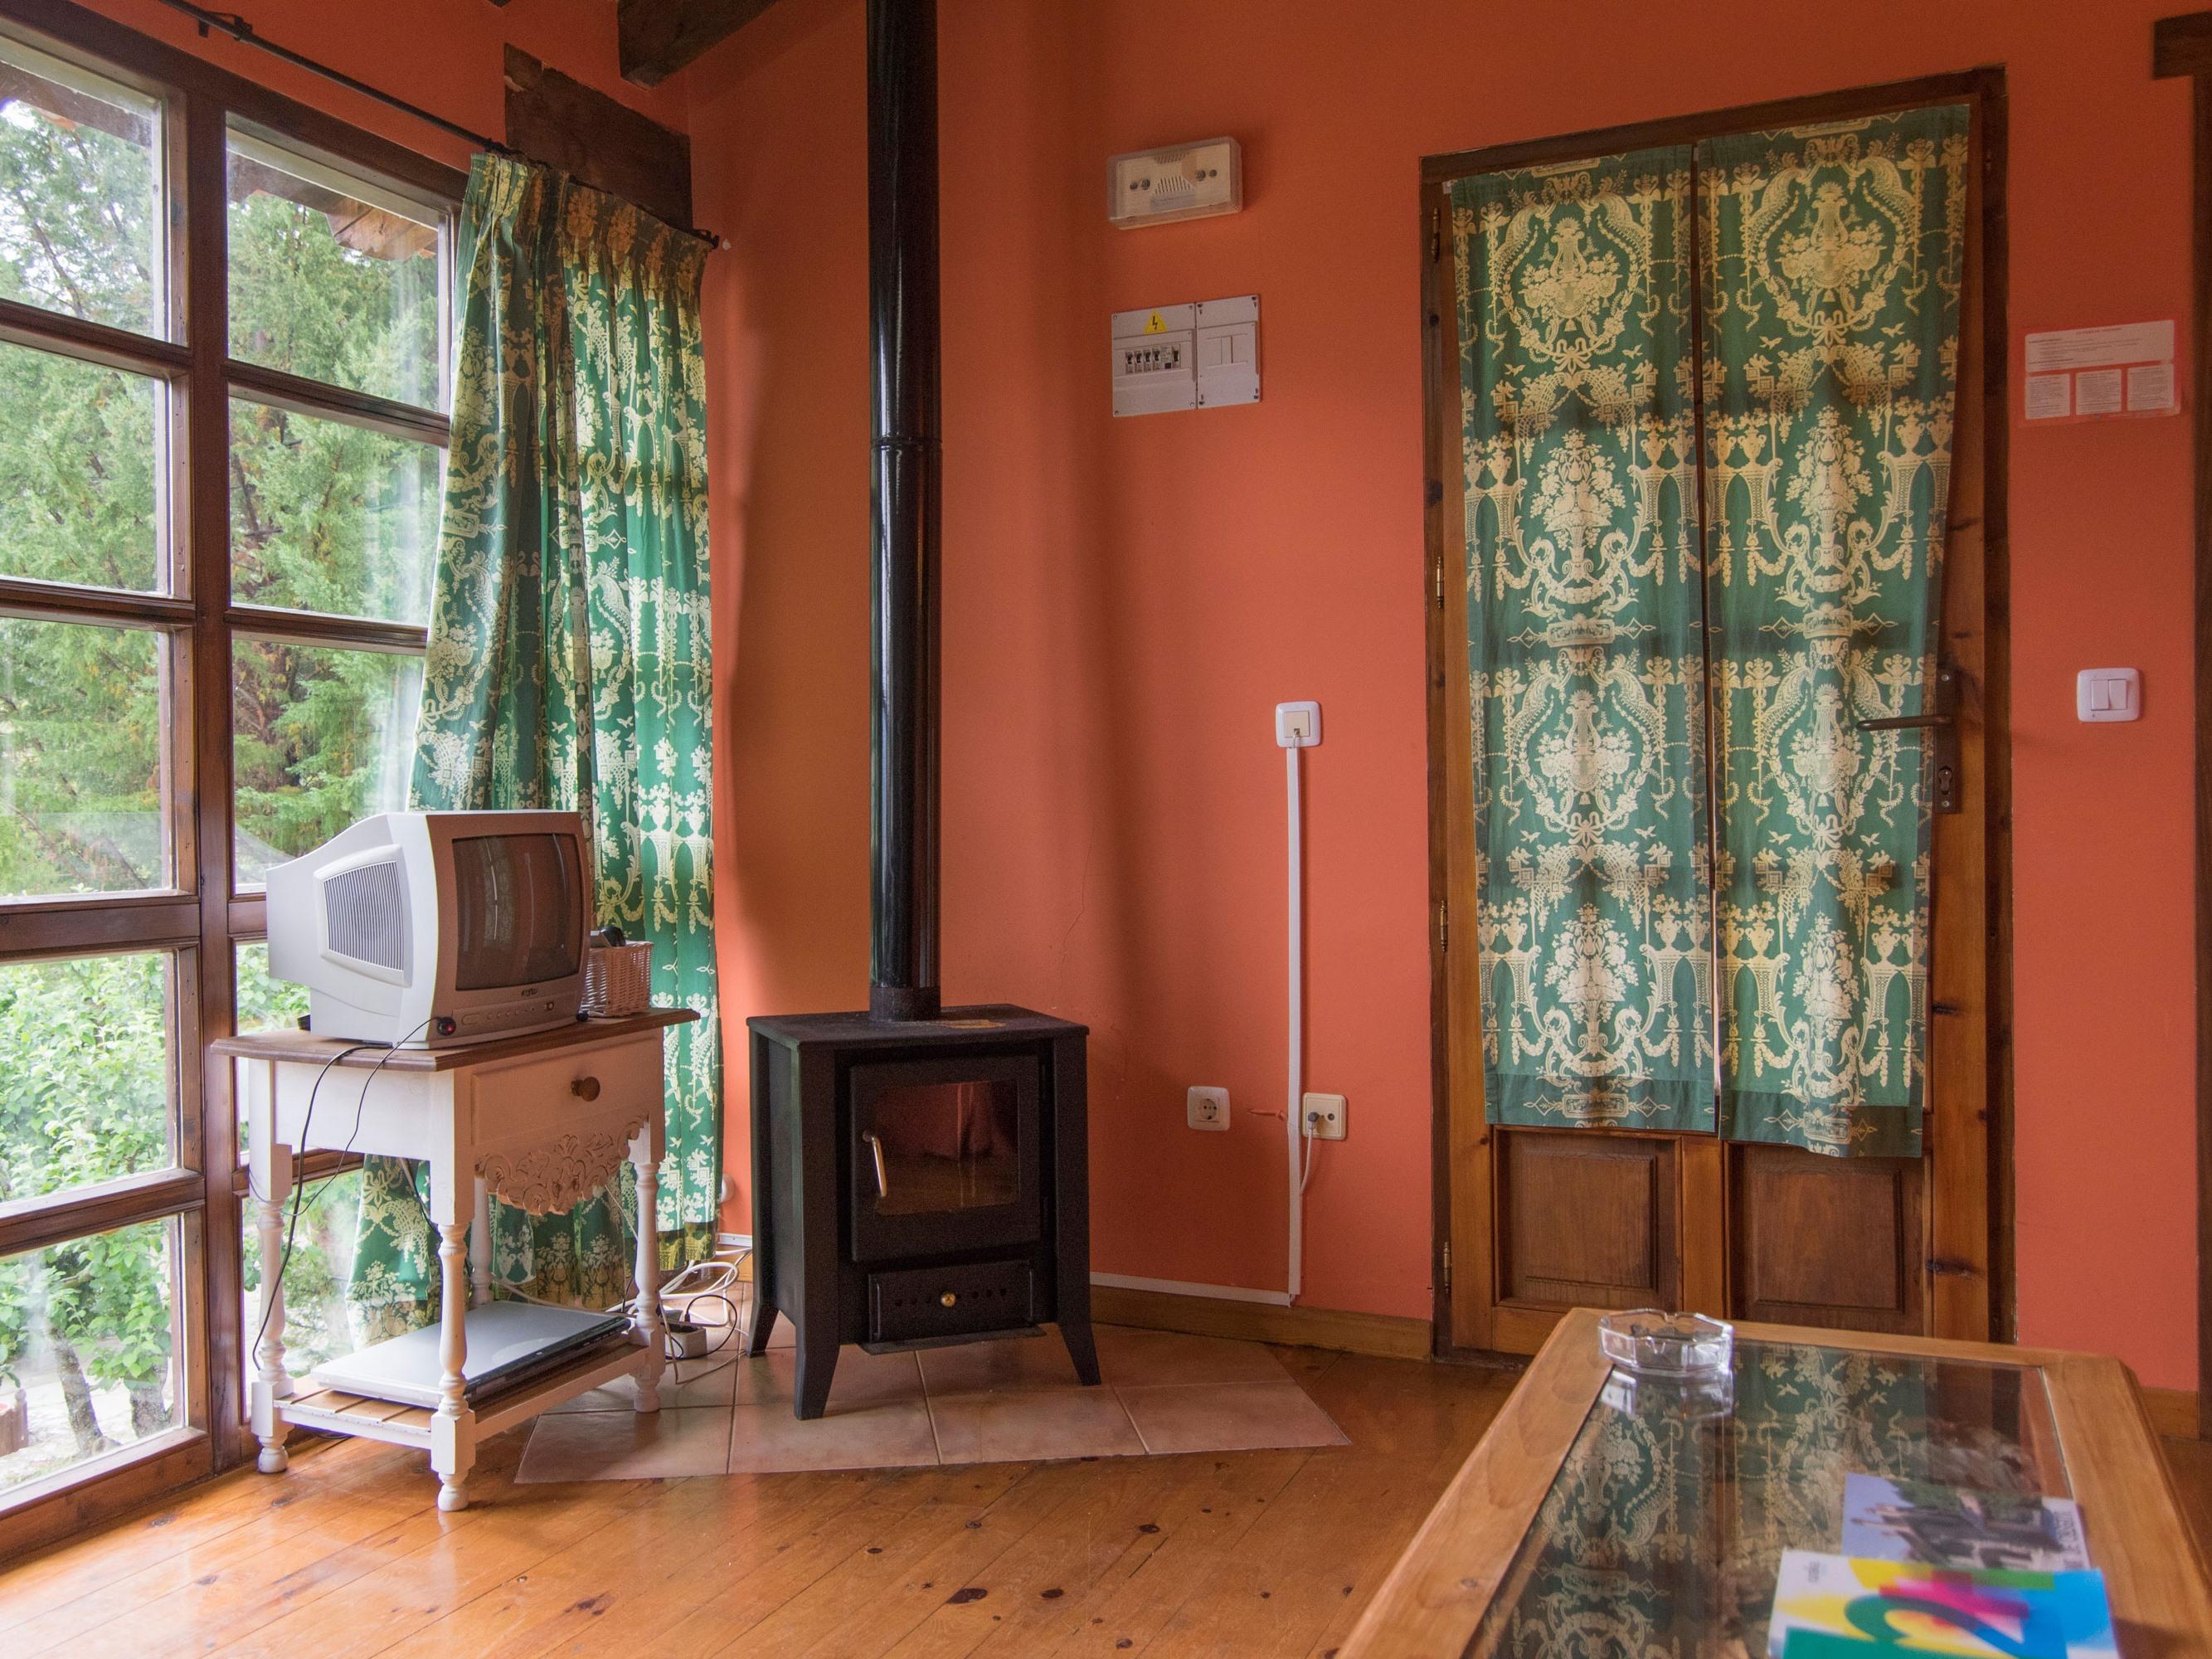 Apartamento-Baño con ducha-Vivienda 24